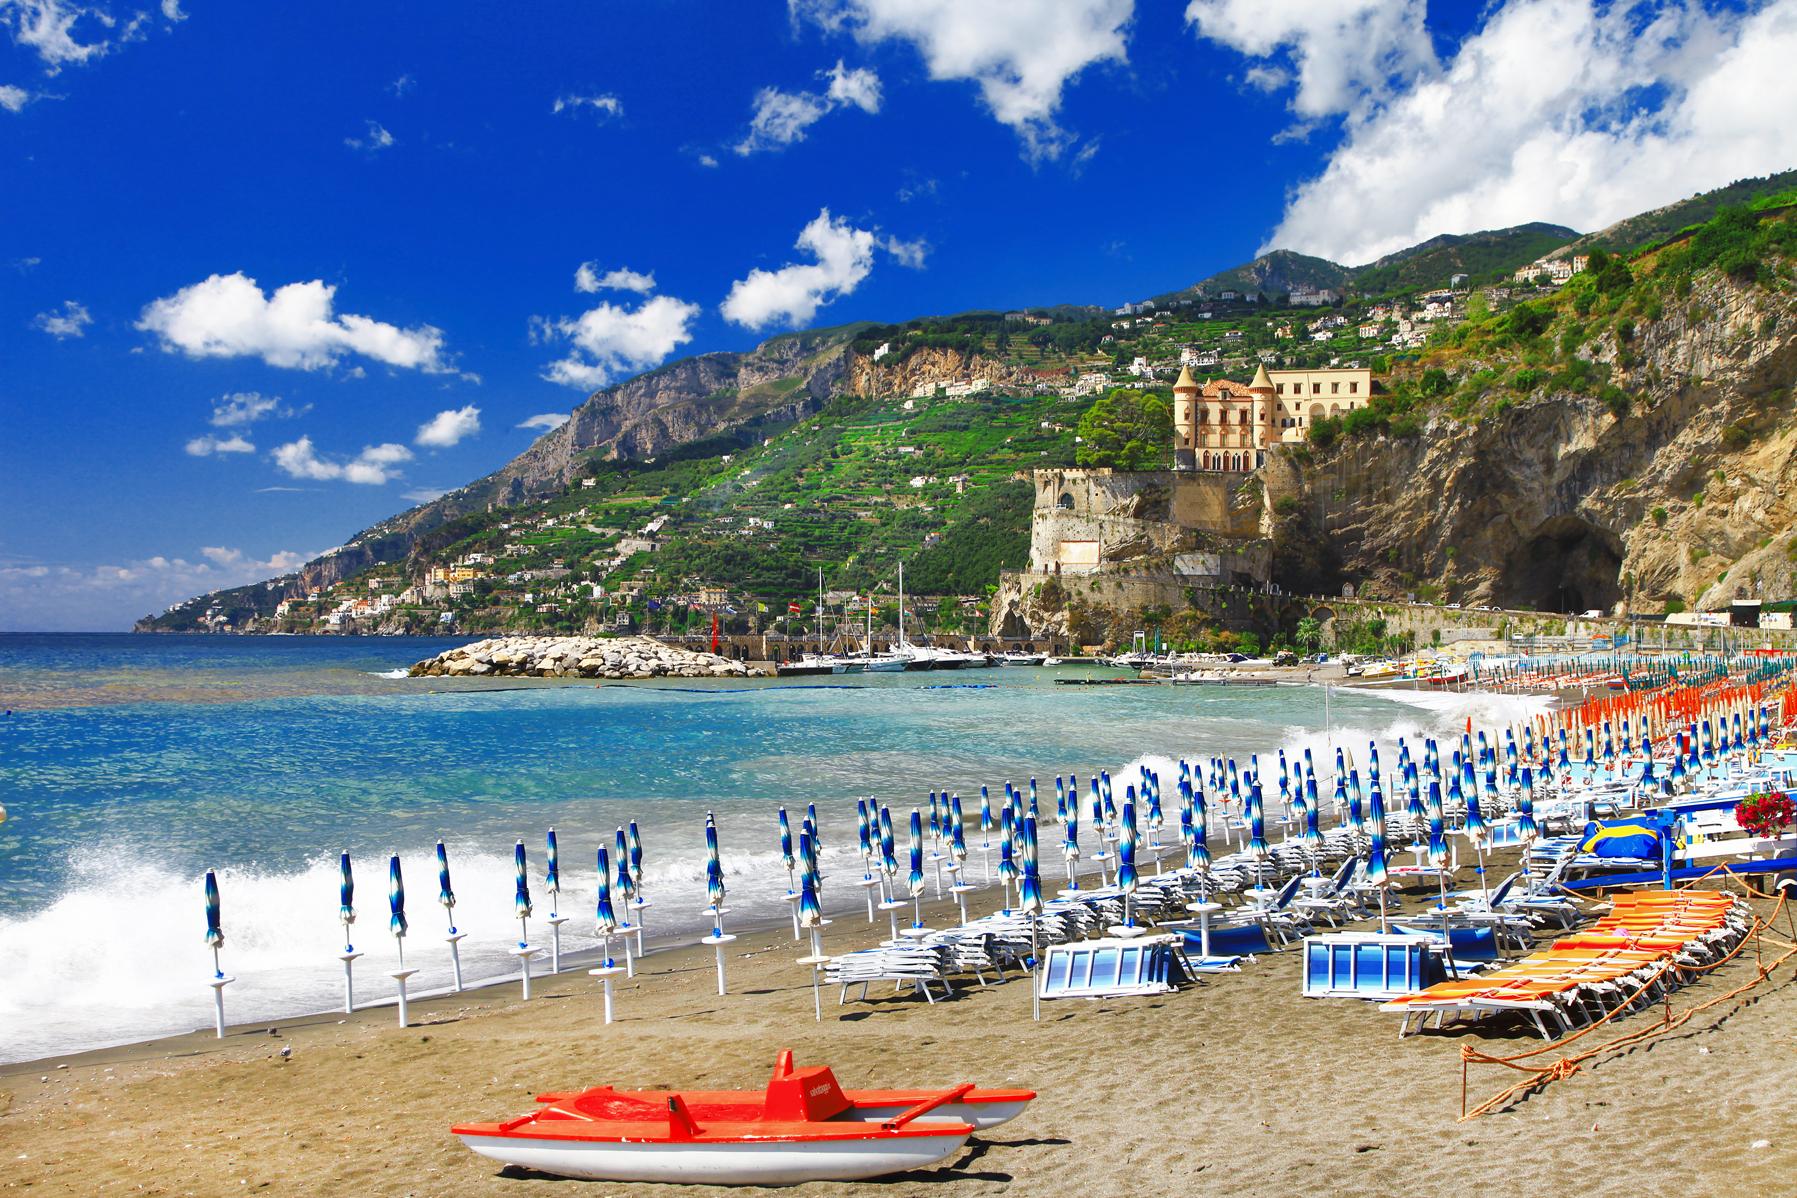 Matrimonio Spiaggia Costiera Amalfitana : Maiori in costiera amalfitana